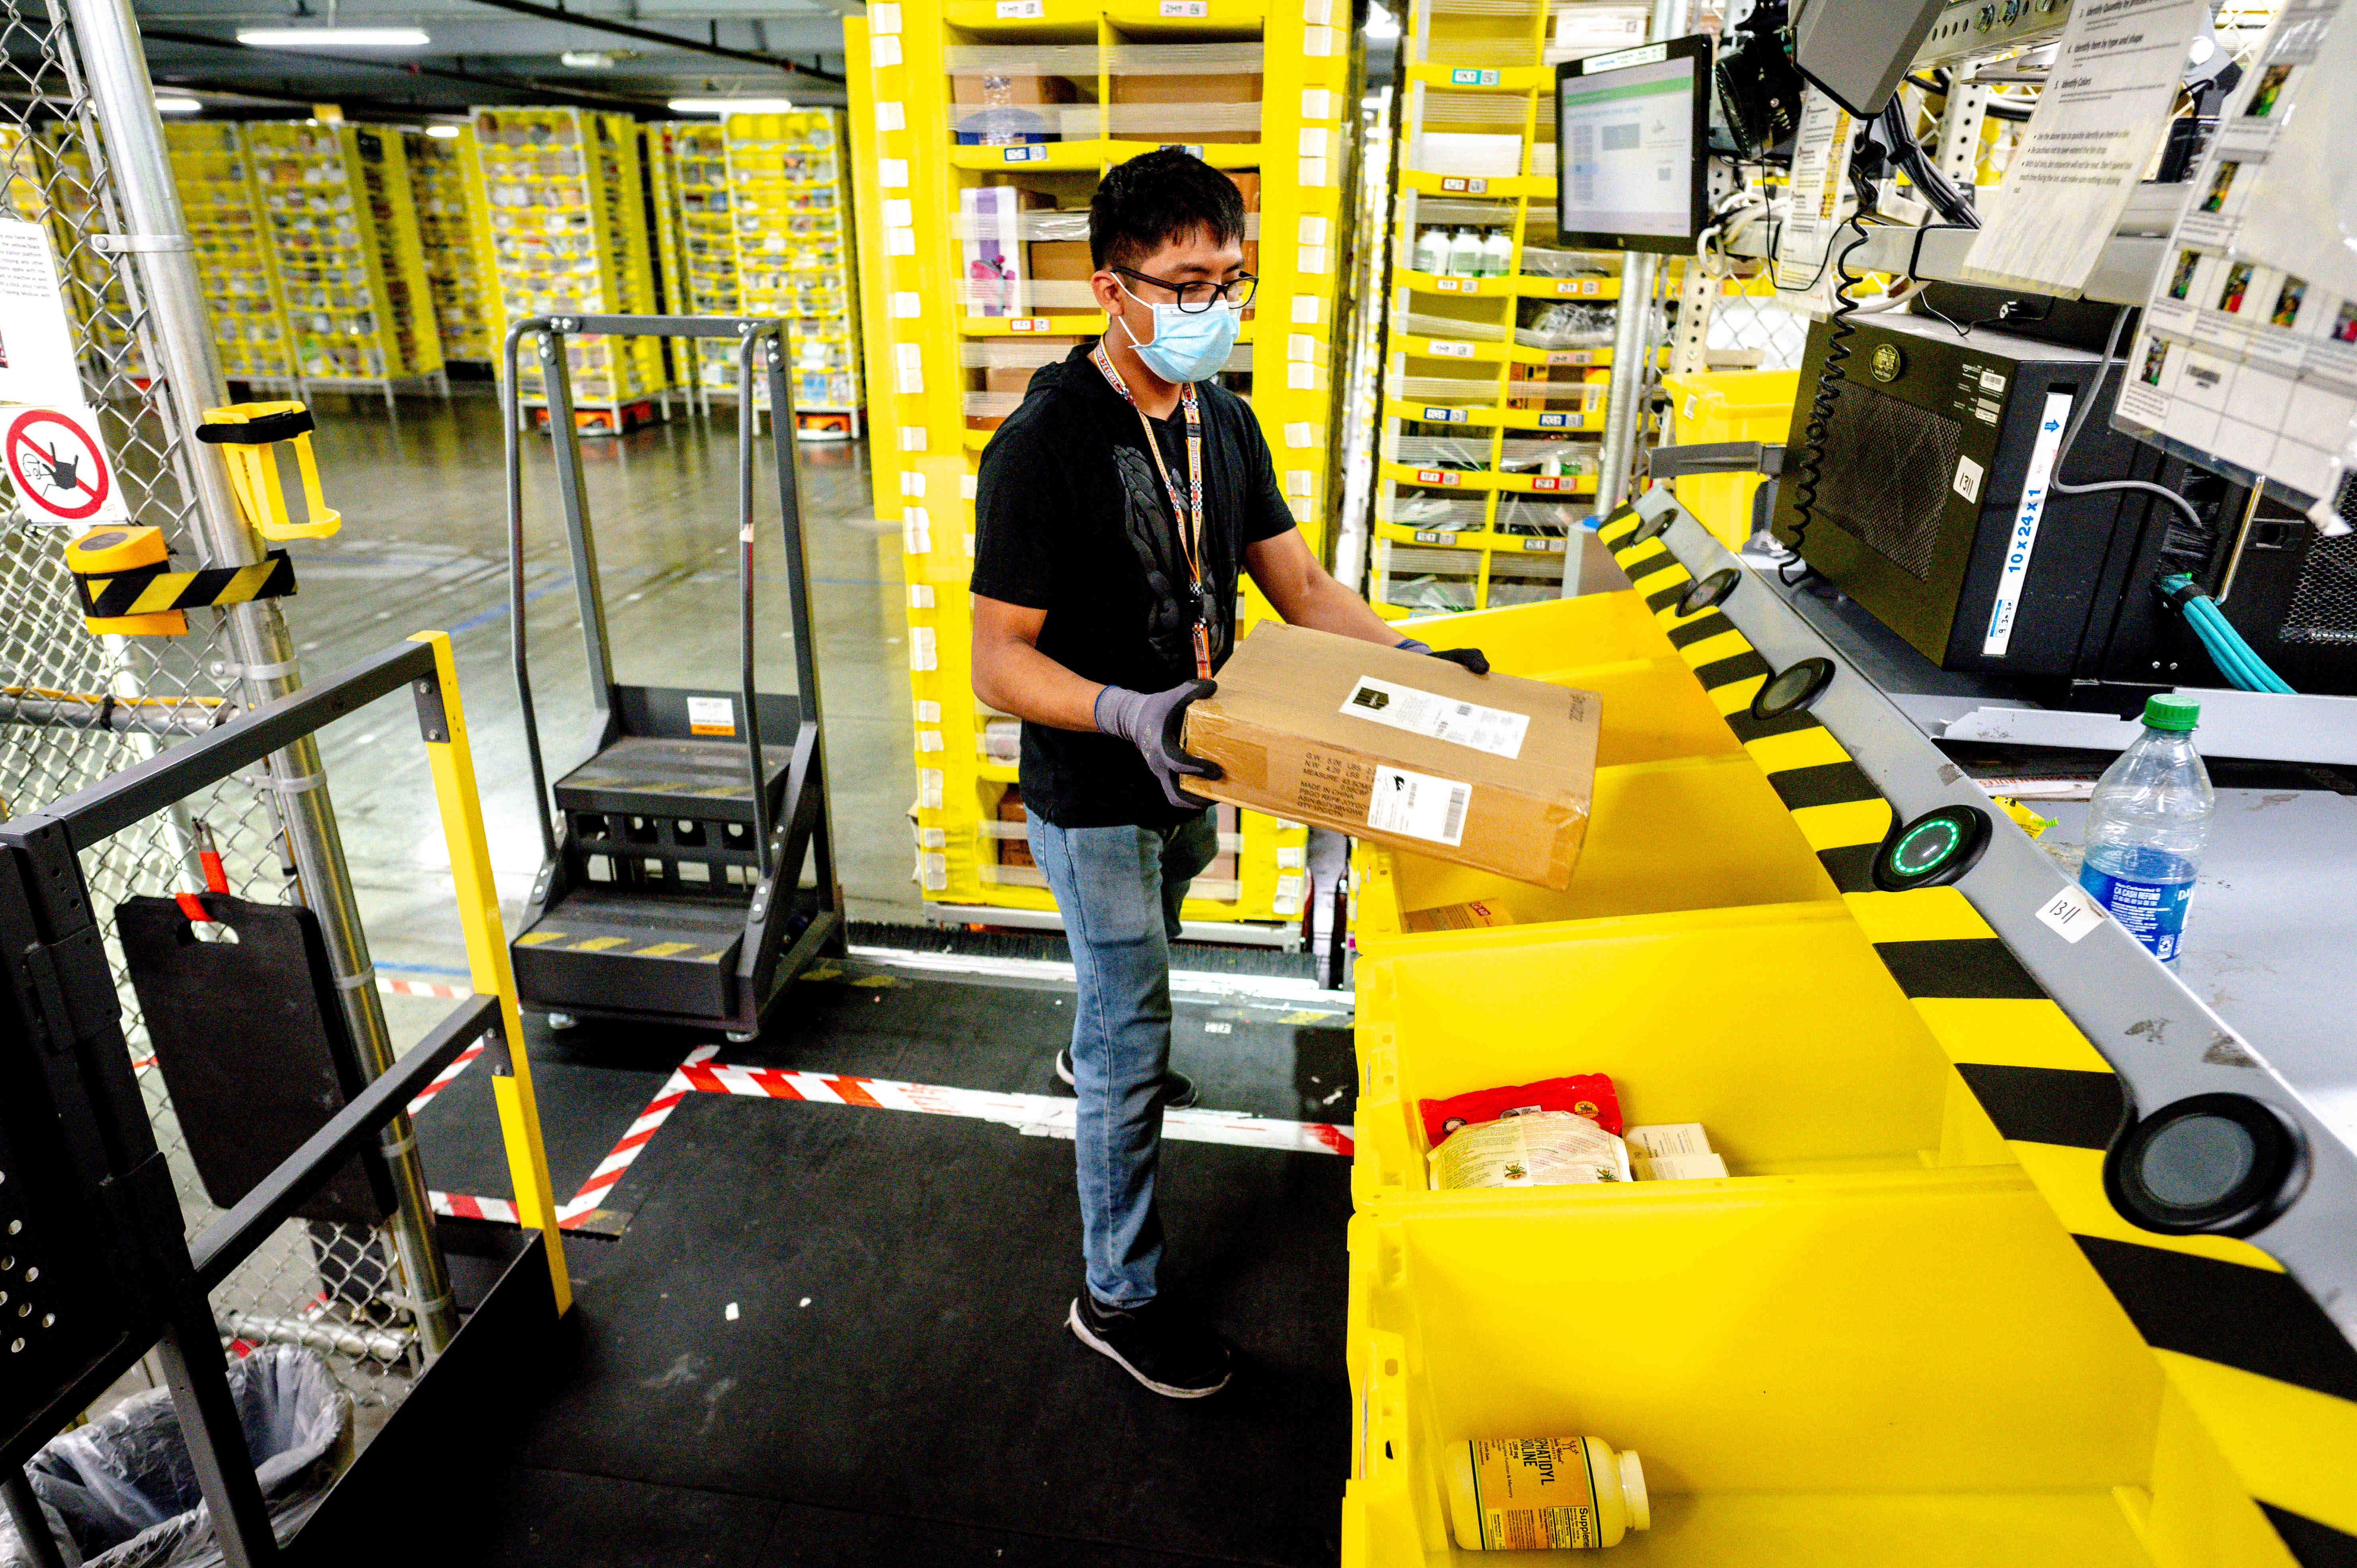 Amazon plans to hire 150,000 seasonal staff for the holiday season